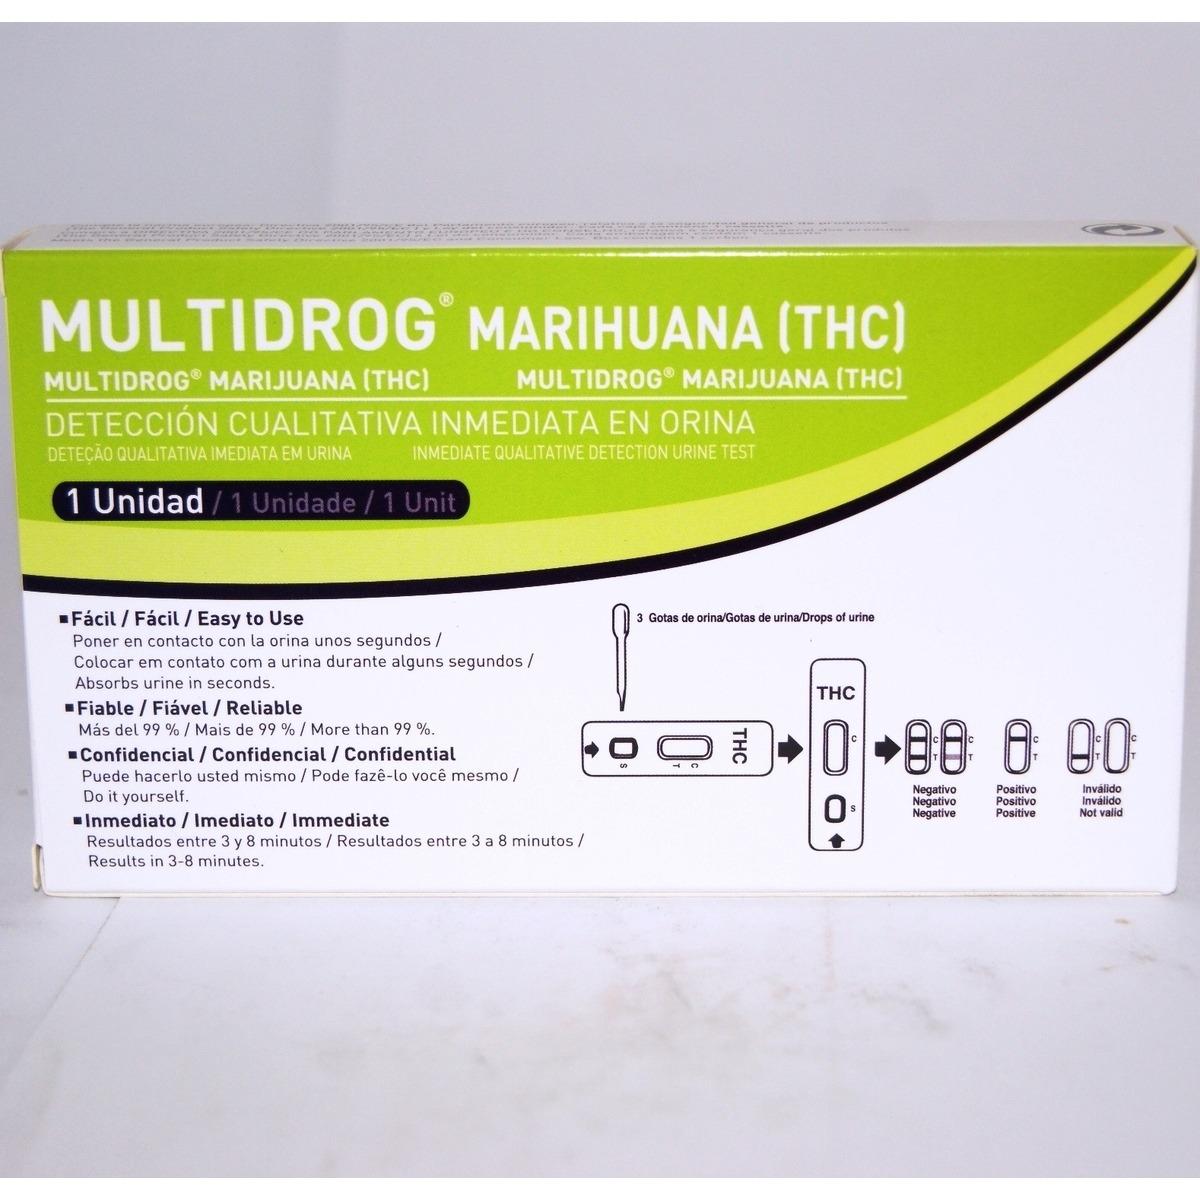 MULTIDROG TEST MARIHUANA THC 1 UNIDAD.